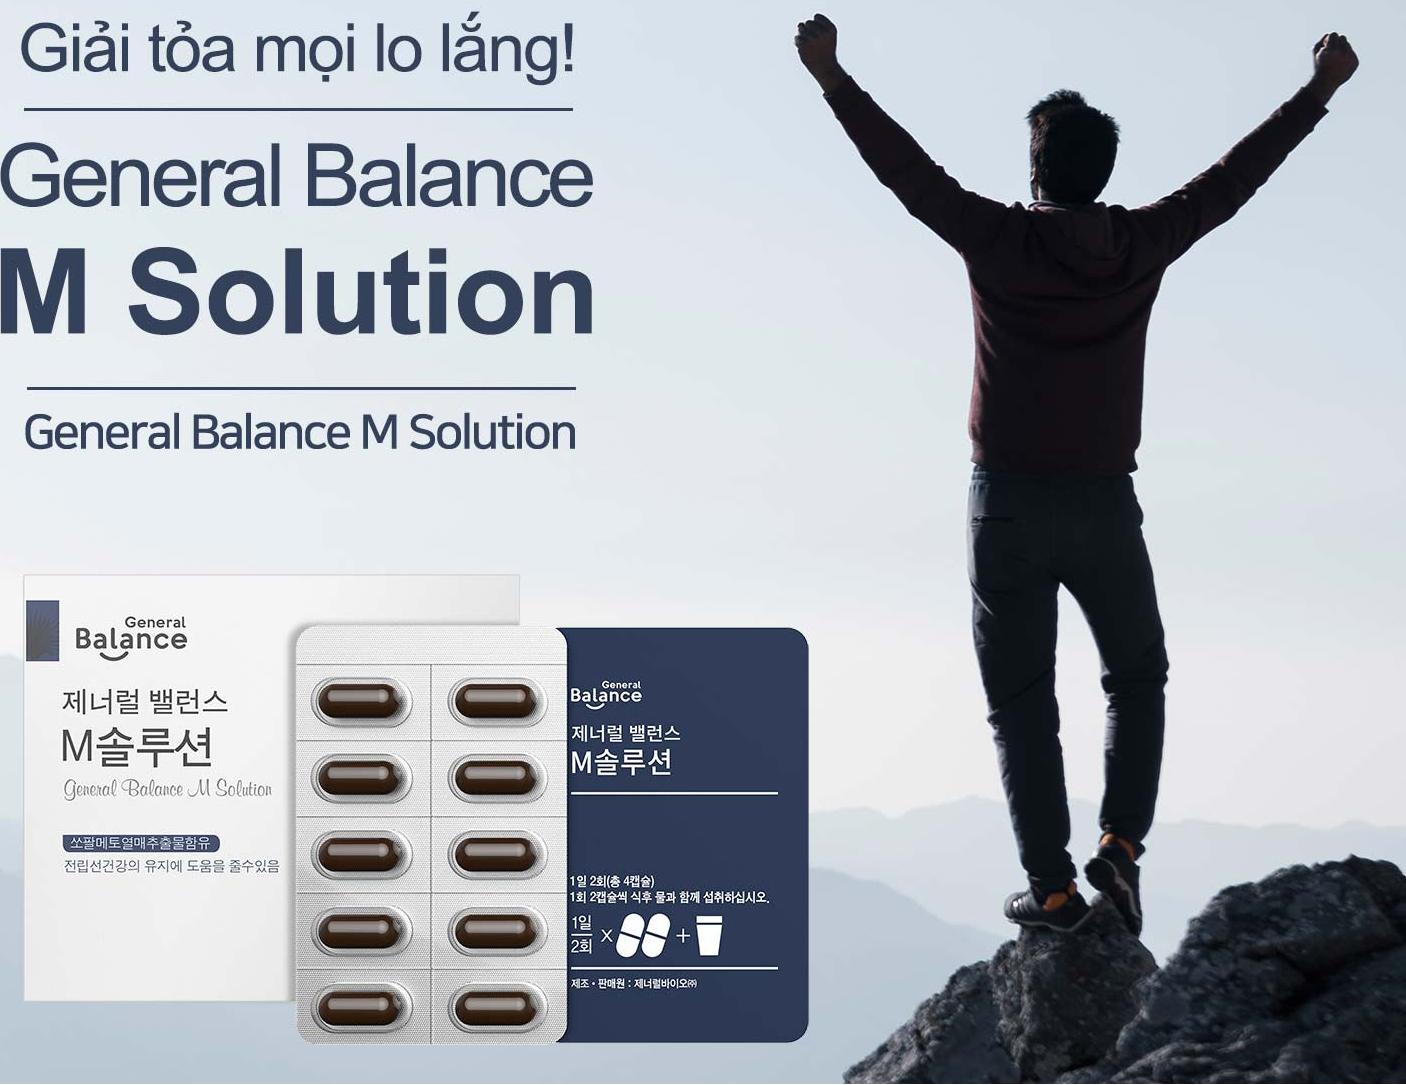 Thực phẩm bảo về sức khỏe General Balance M Solution GCOOP